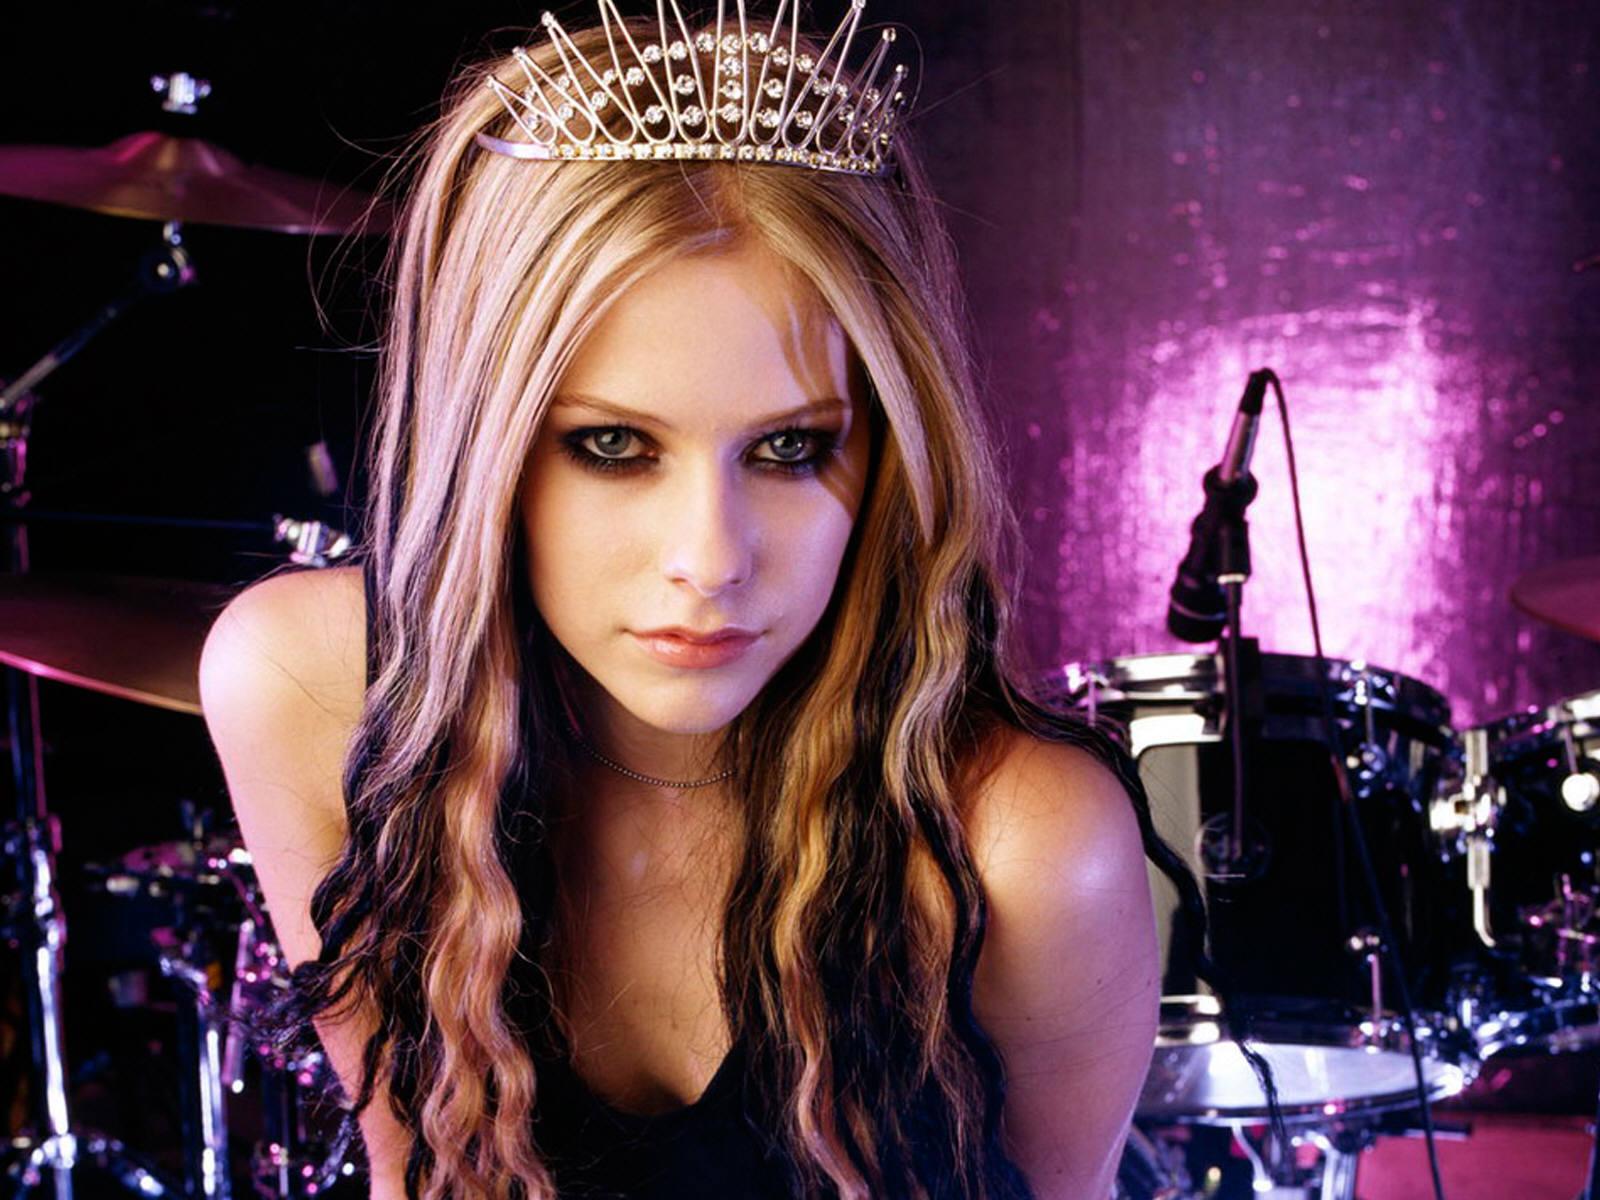 http://2.bp.blogspot.com/-wzZXaxQjLsE/UB4pyrH_msI/AAAAAAAABAI/8vrSSEhVjTQ/s1600/048+Avril+Lavigne+Images.jpg